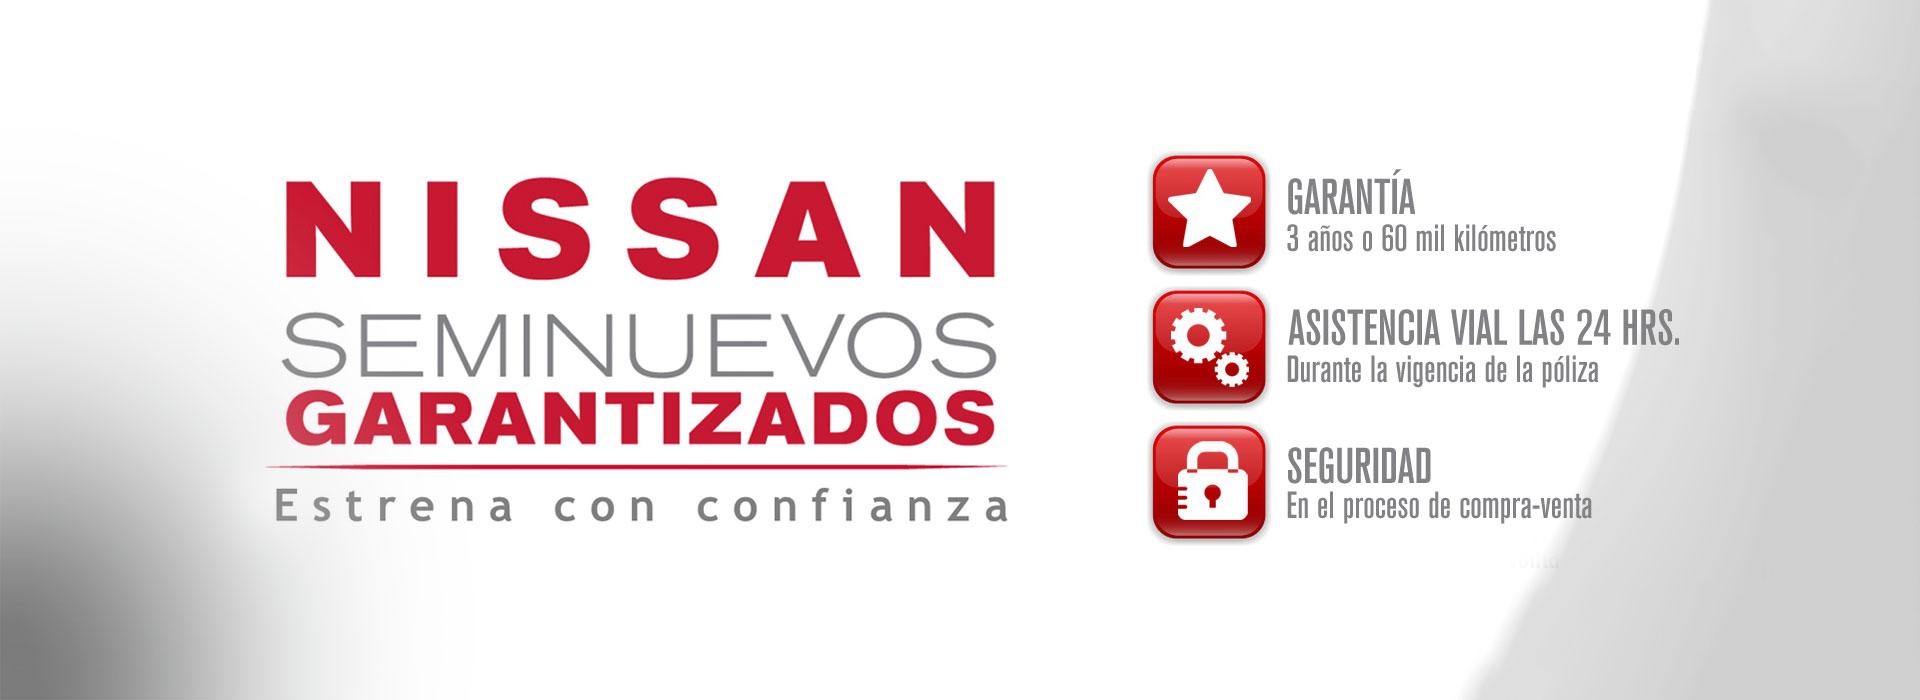 Nissan Seminuevos Garantizados